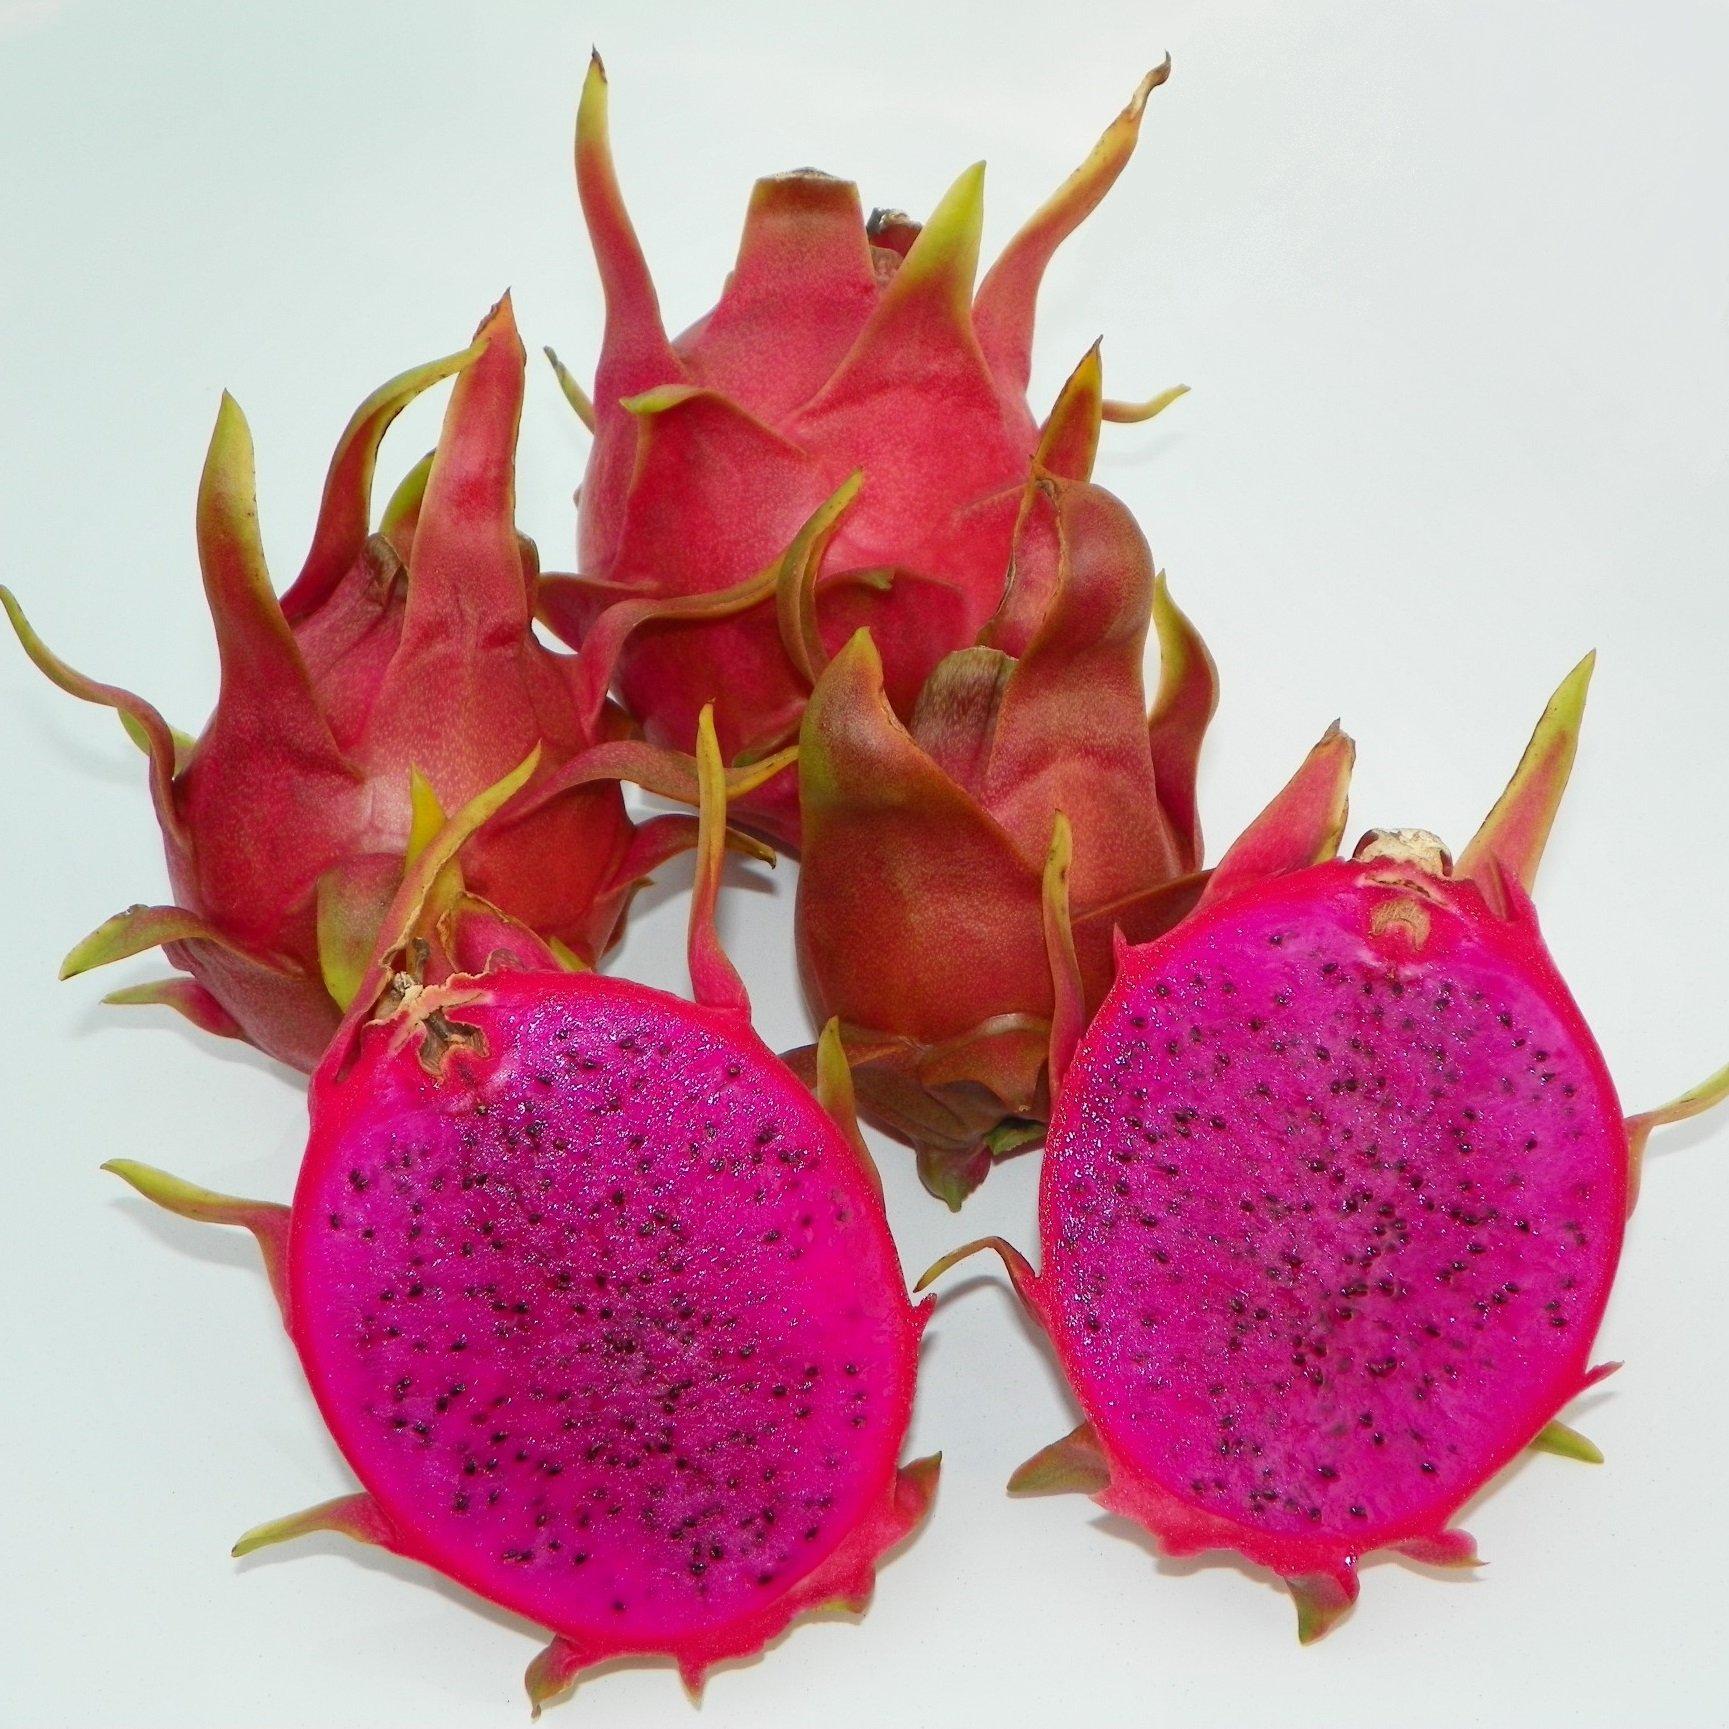 Dragon Fruit variety Dark Star fruit sliced